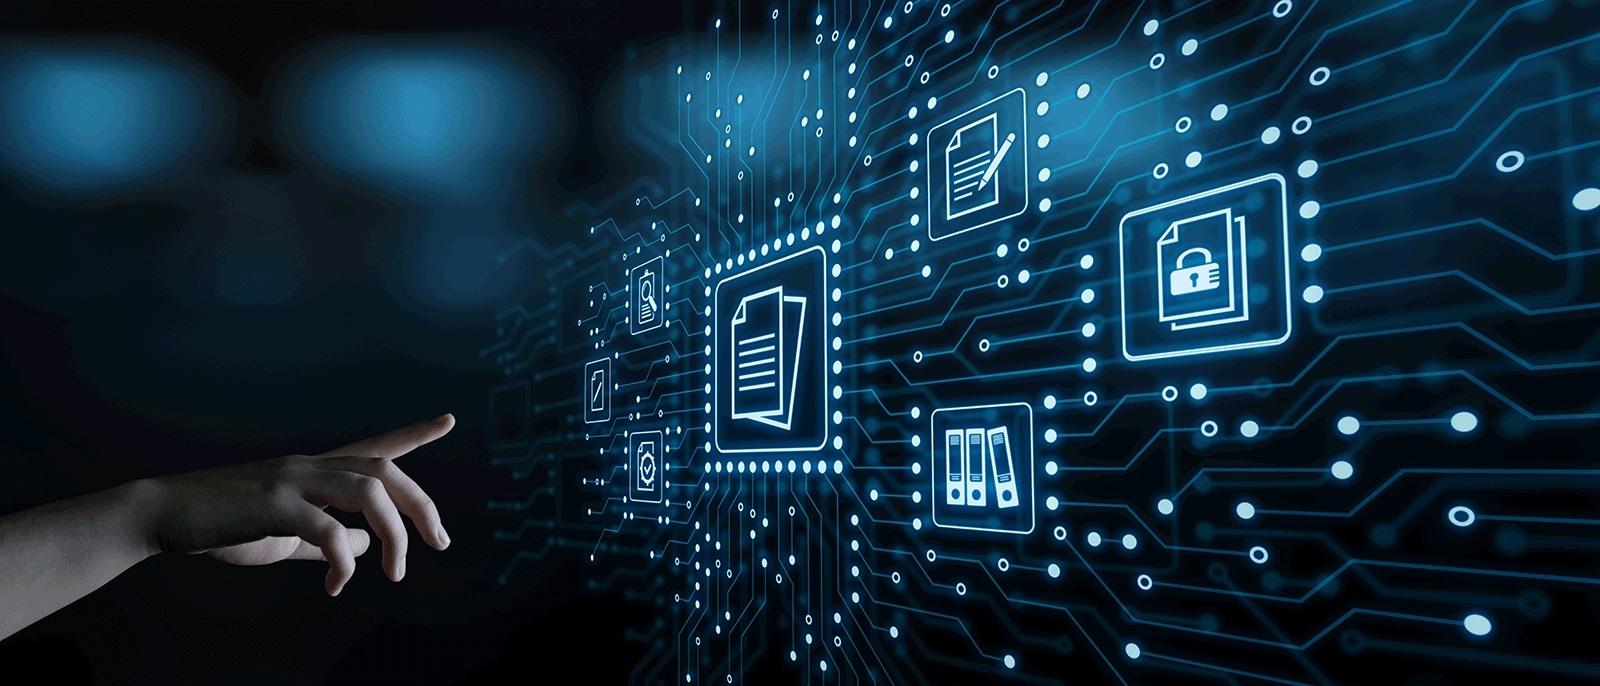 smeup software archiviazione e gestione documentale